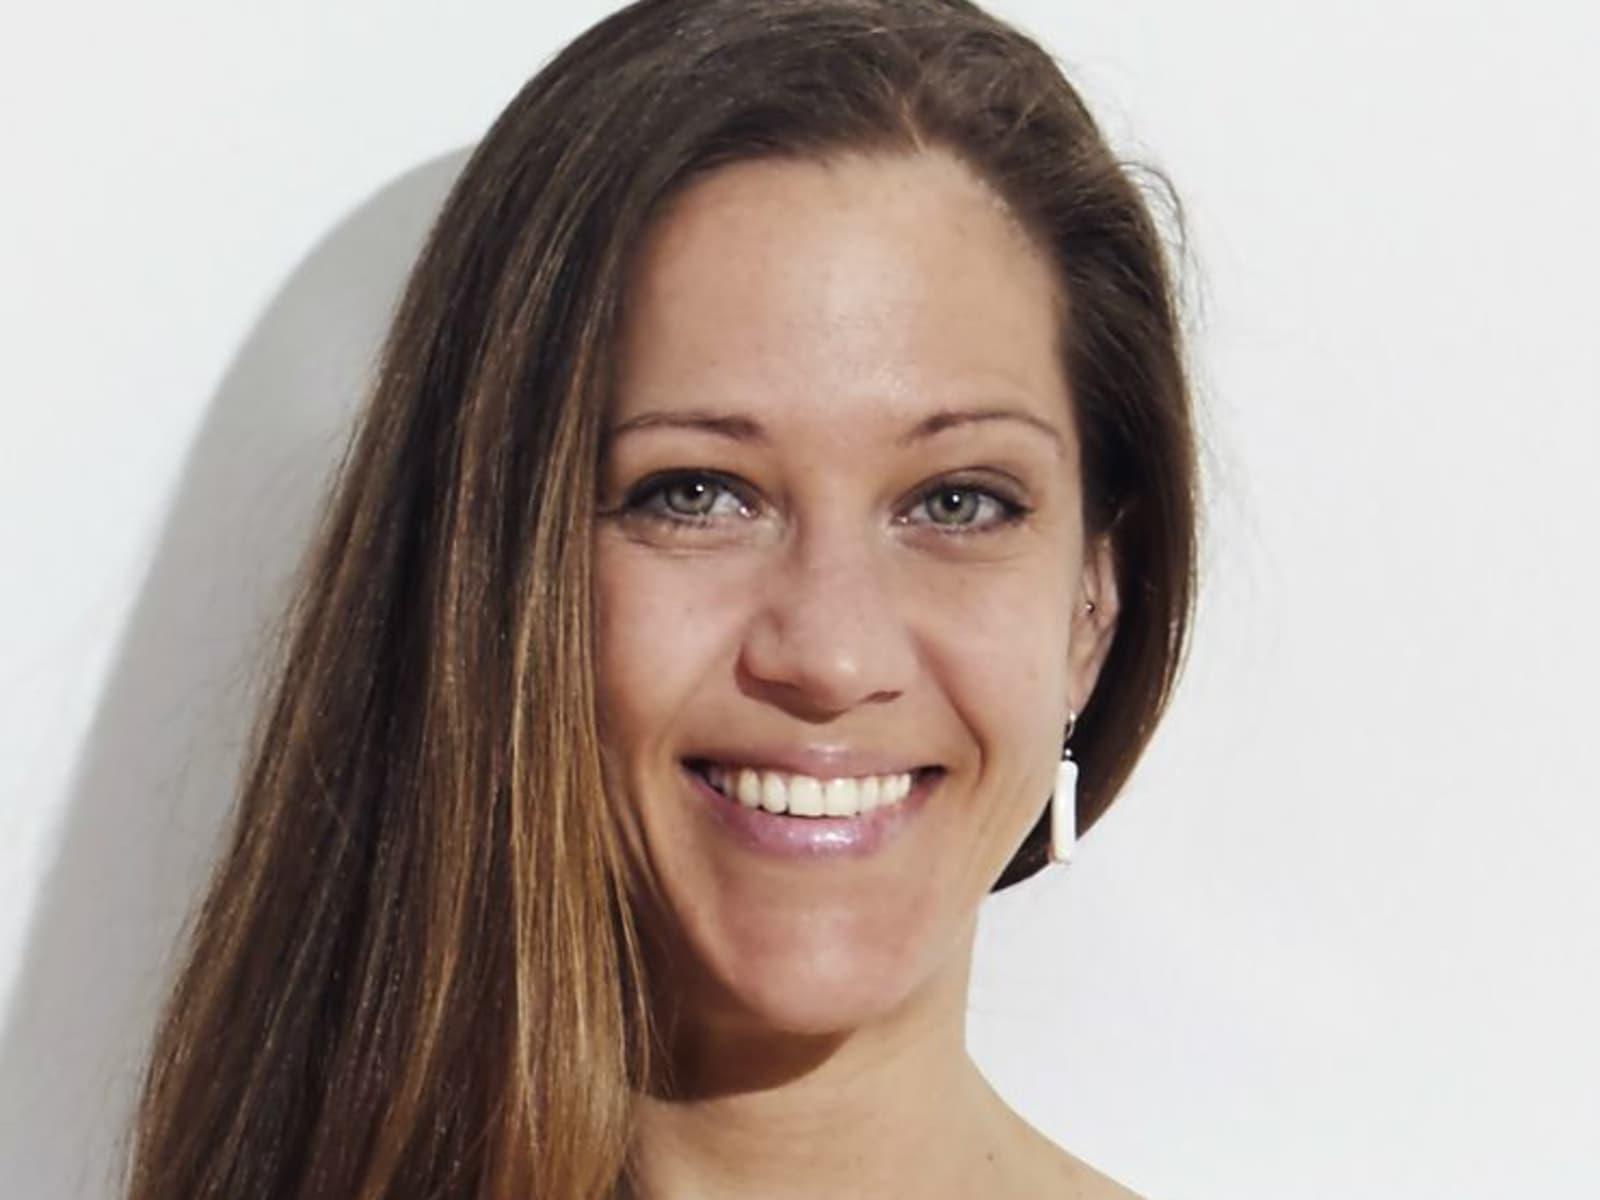 Sarah from Tofino, British Columbia, Canada